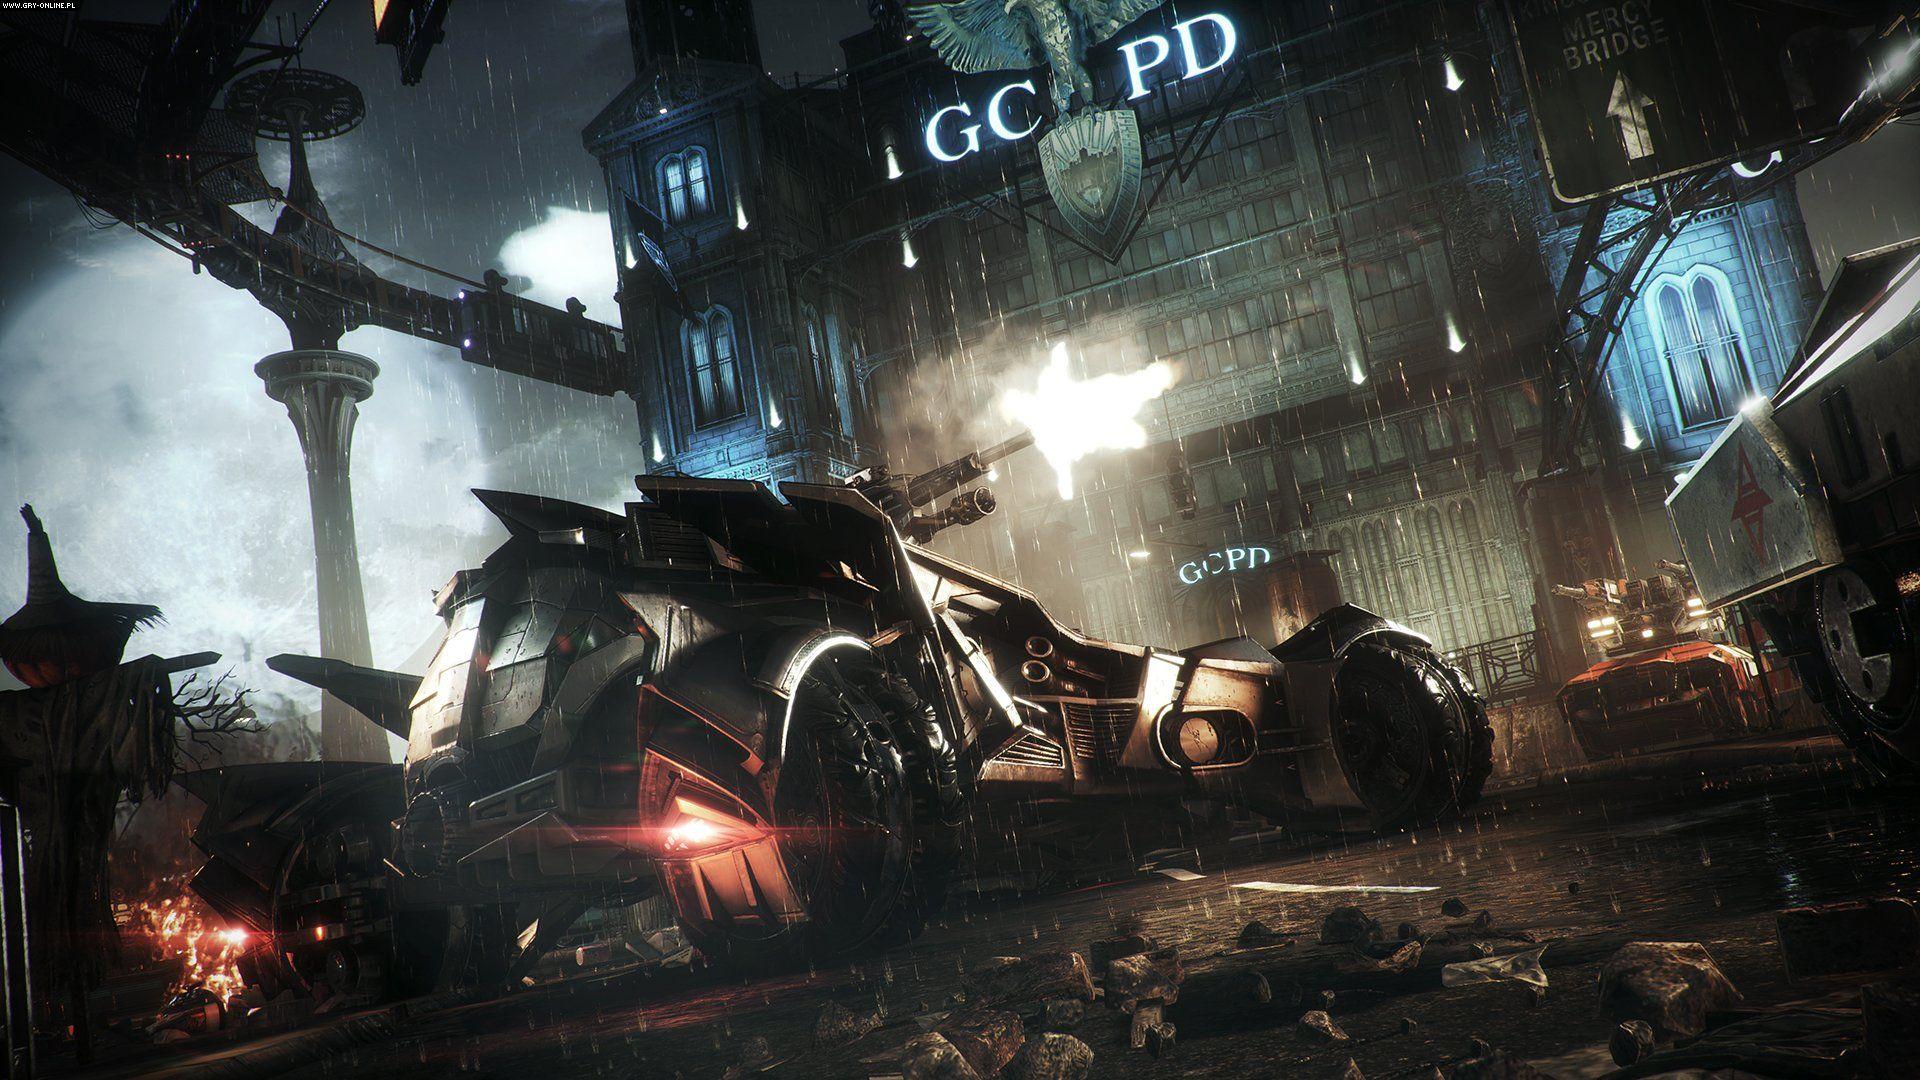 Batman Arkham Knight image #3